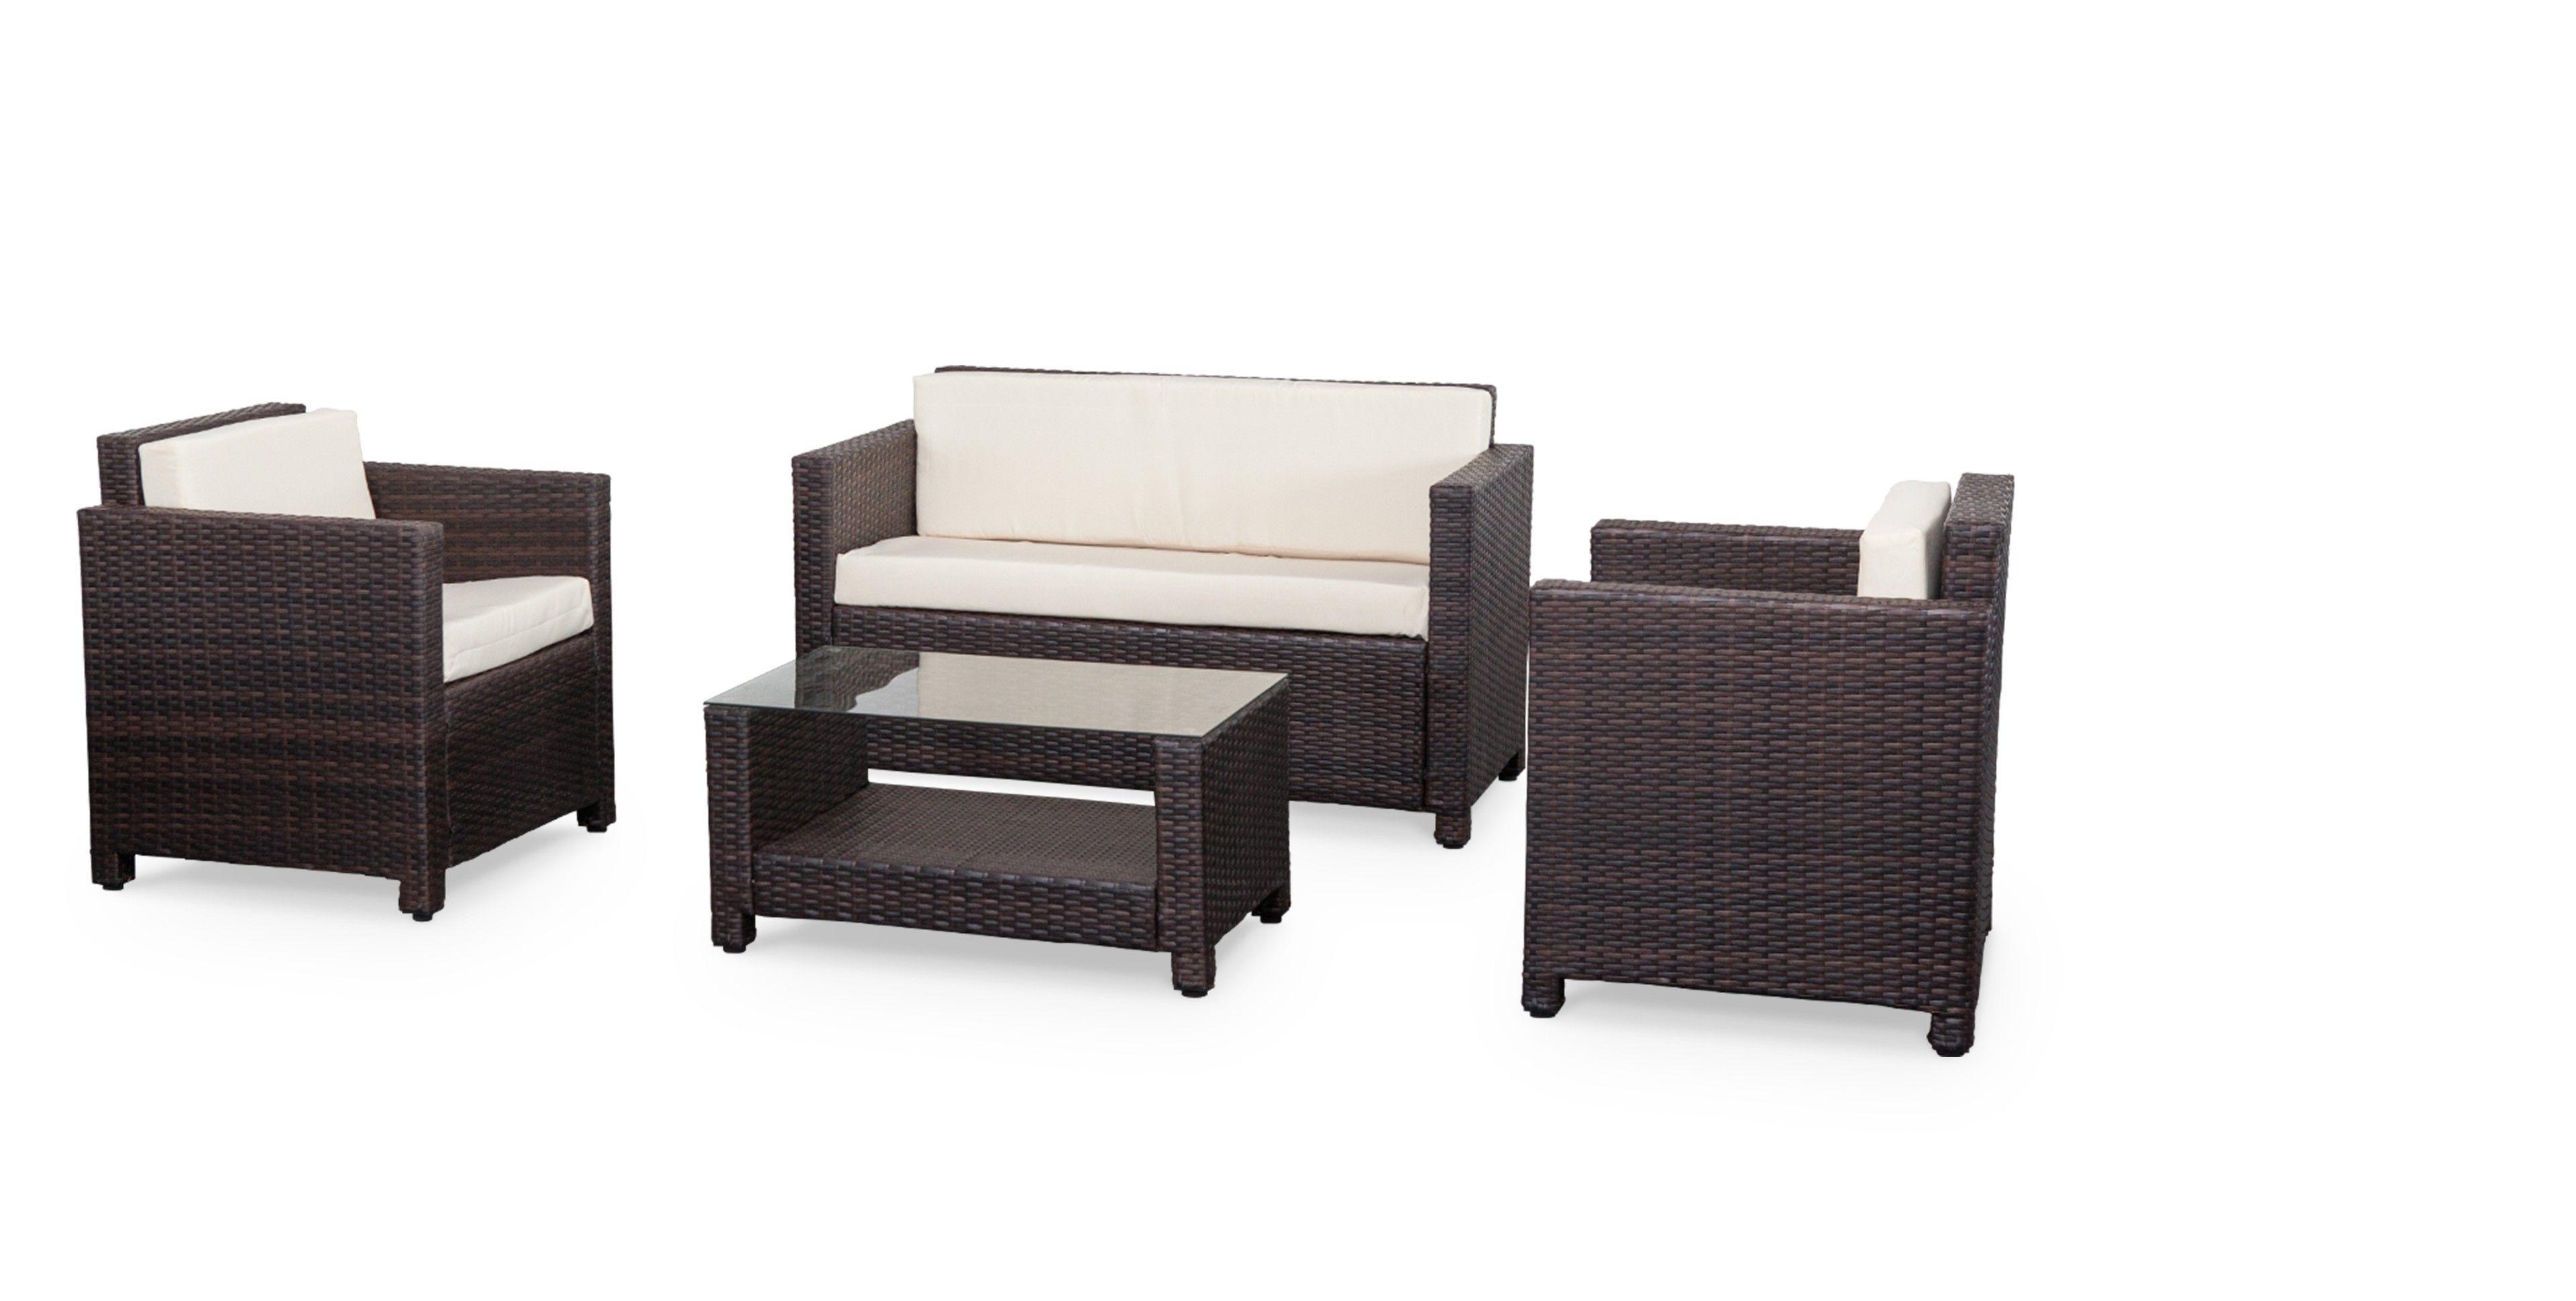 Muebles de jardin, conjunto sofa de exterior, Chocolate Crudo, 4 ...